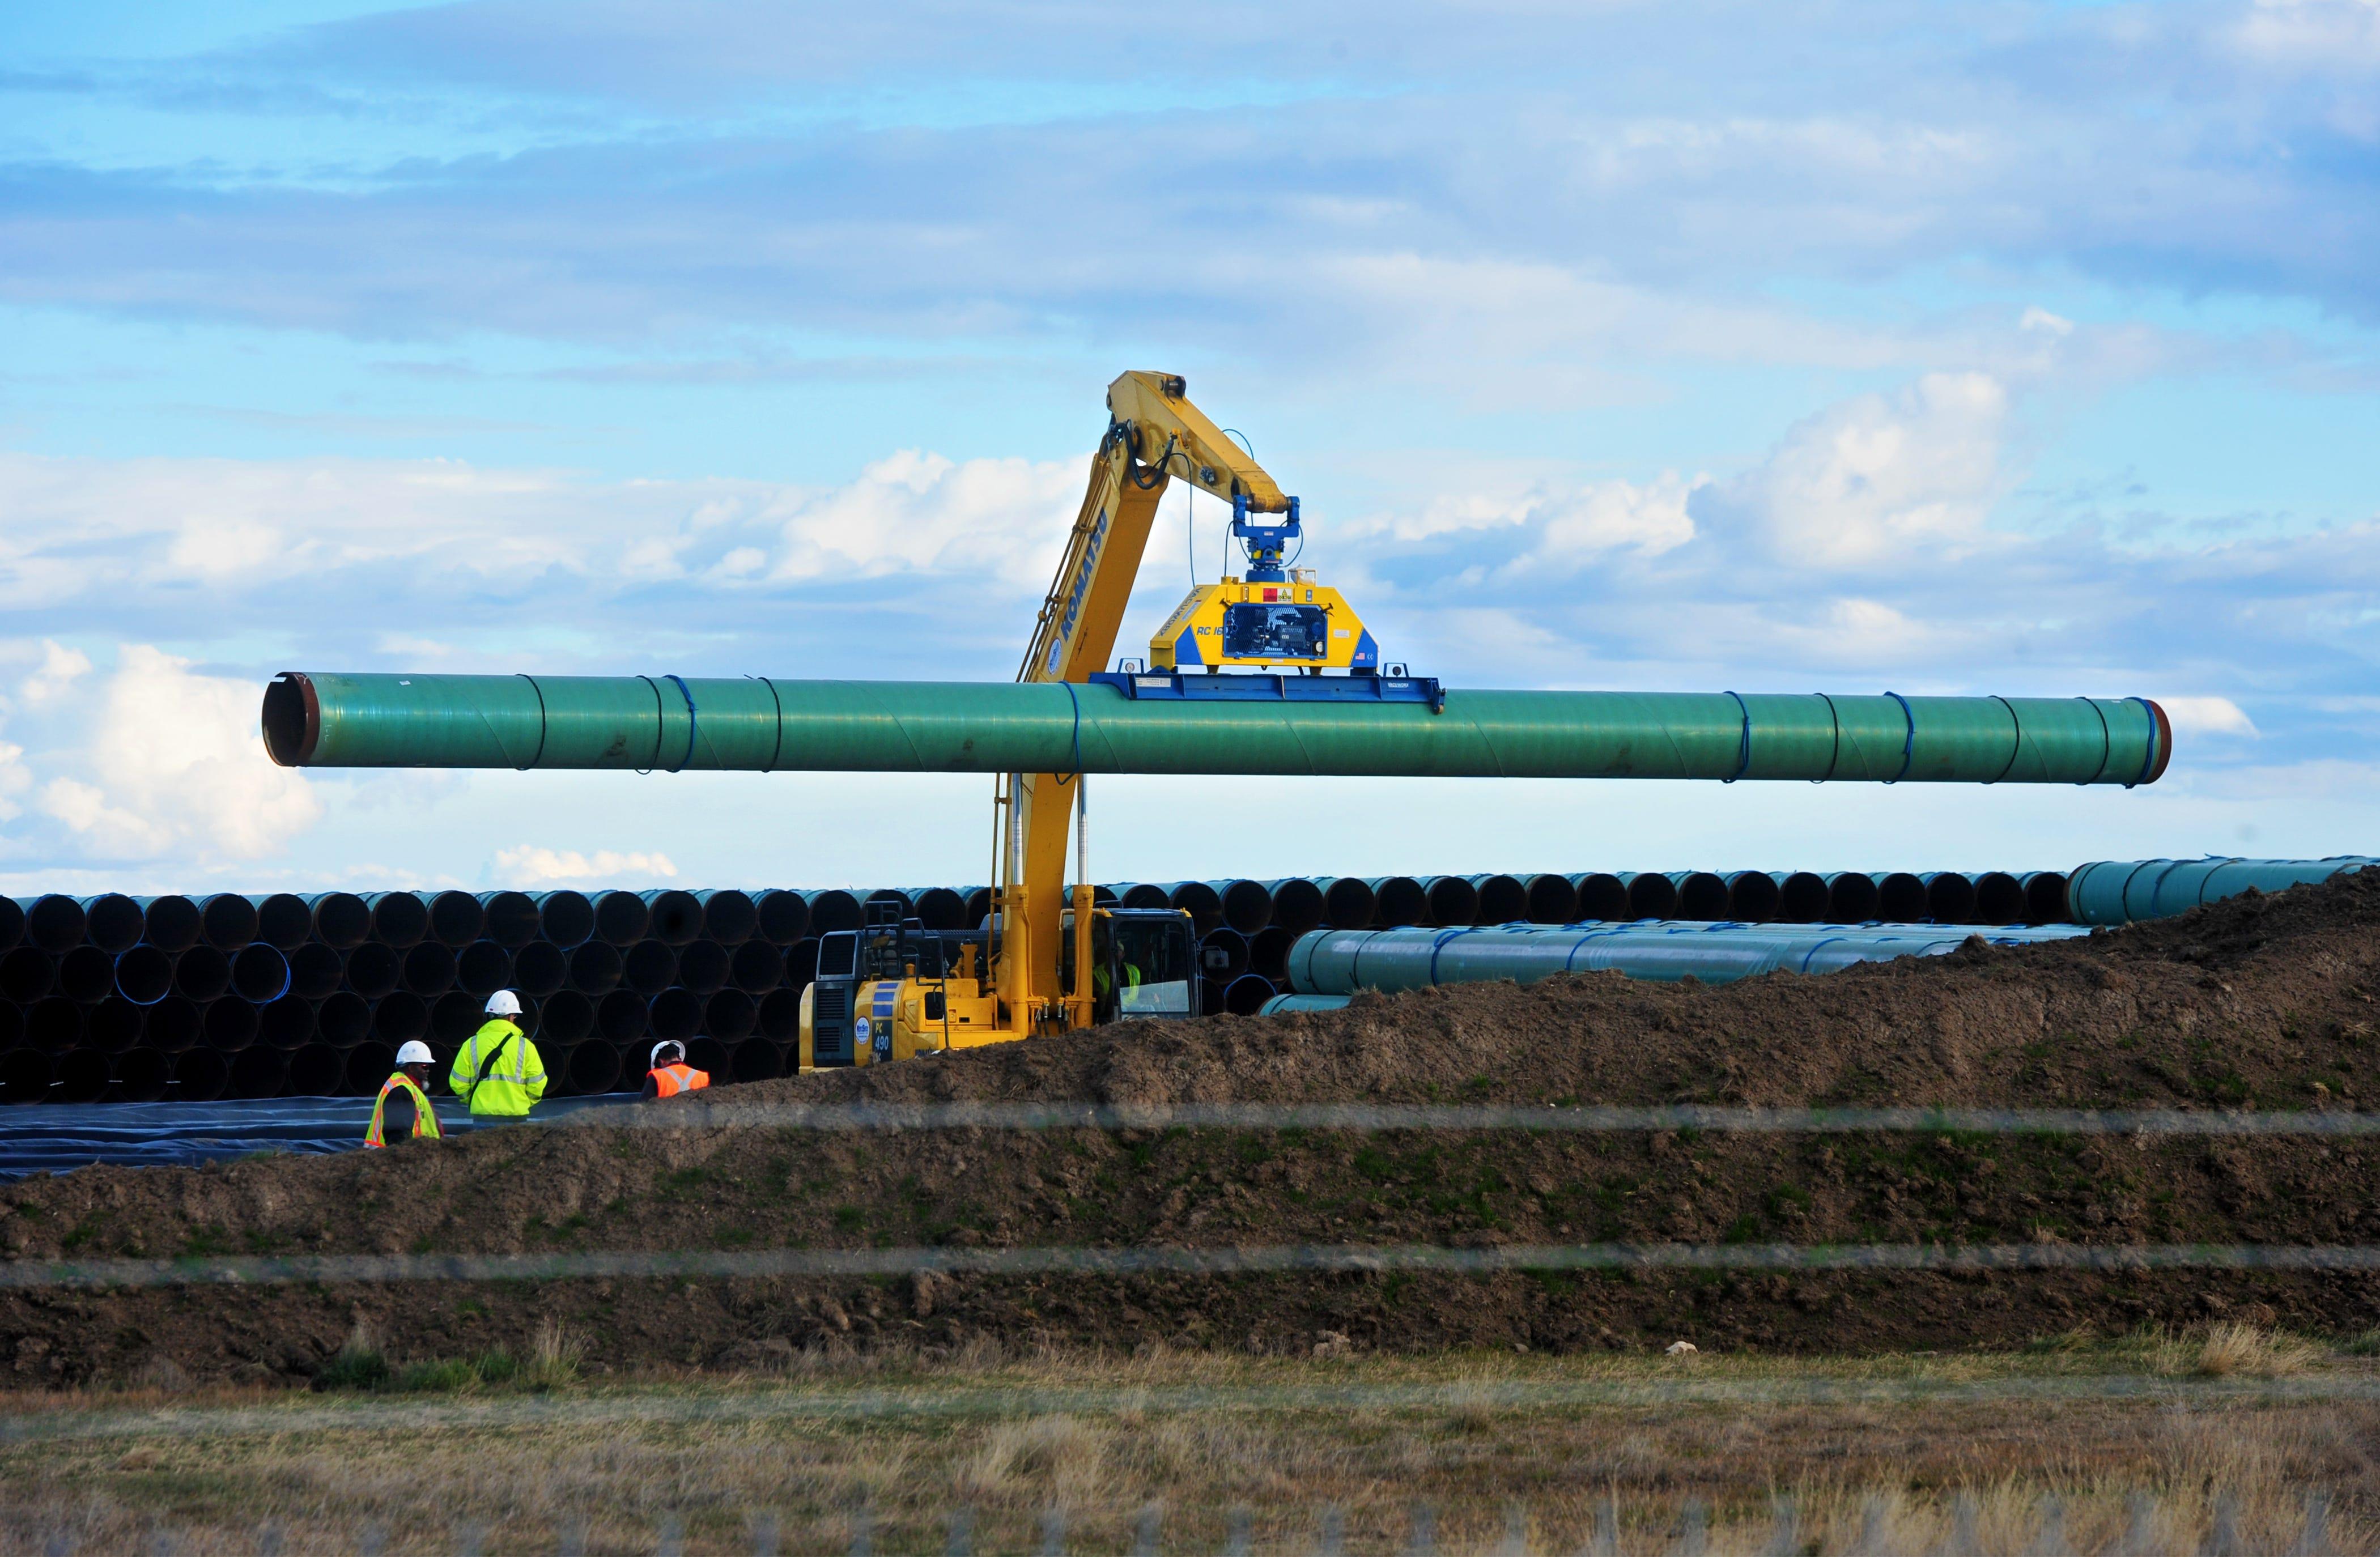 Federal judge blocks construction of Keystone pipeline